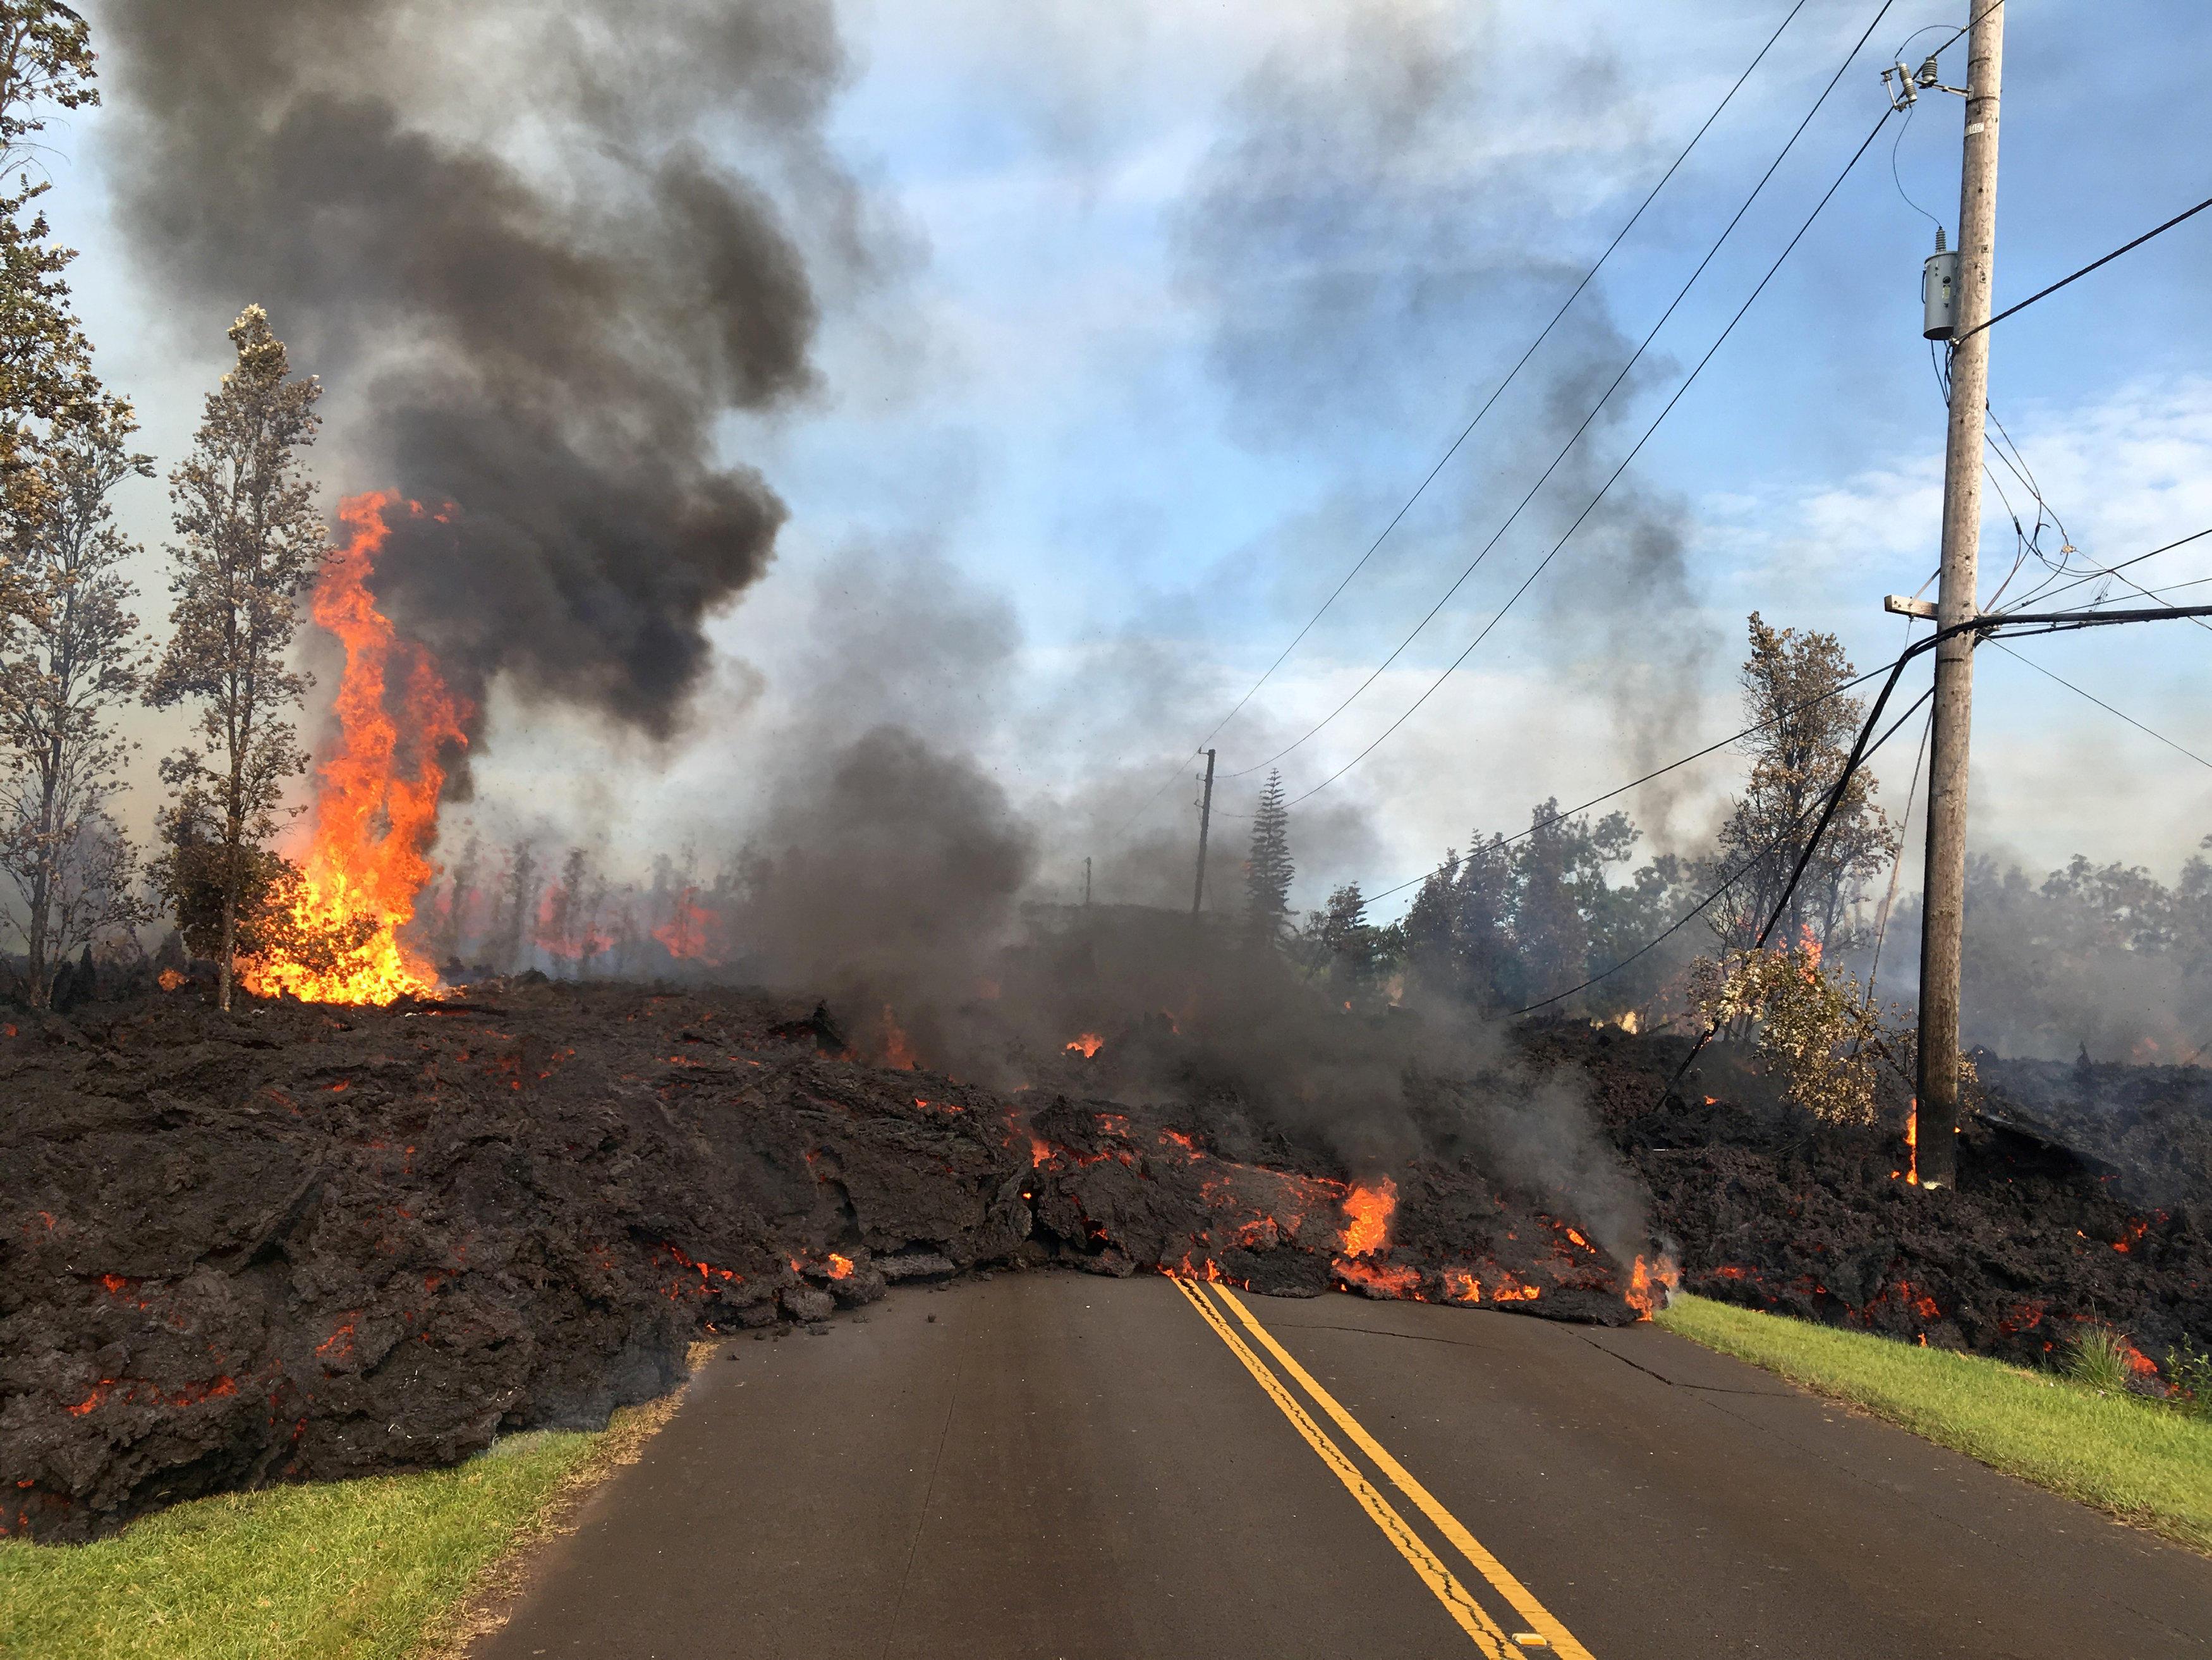 Hawaii's Kilauea volcano eruption destroys 21 homes